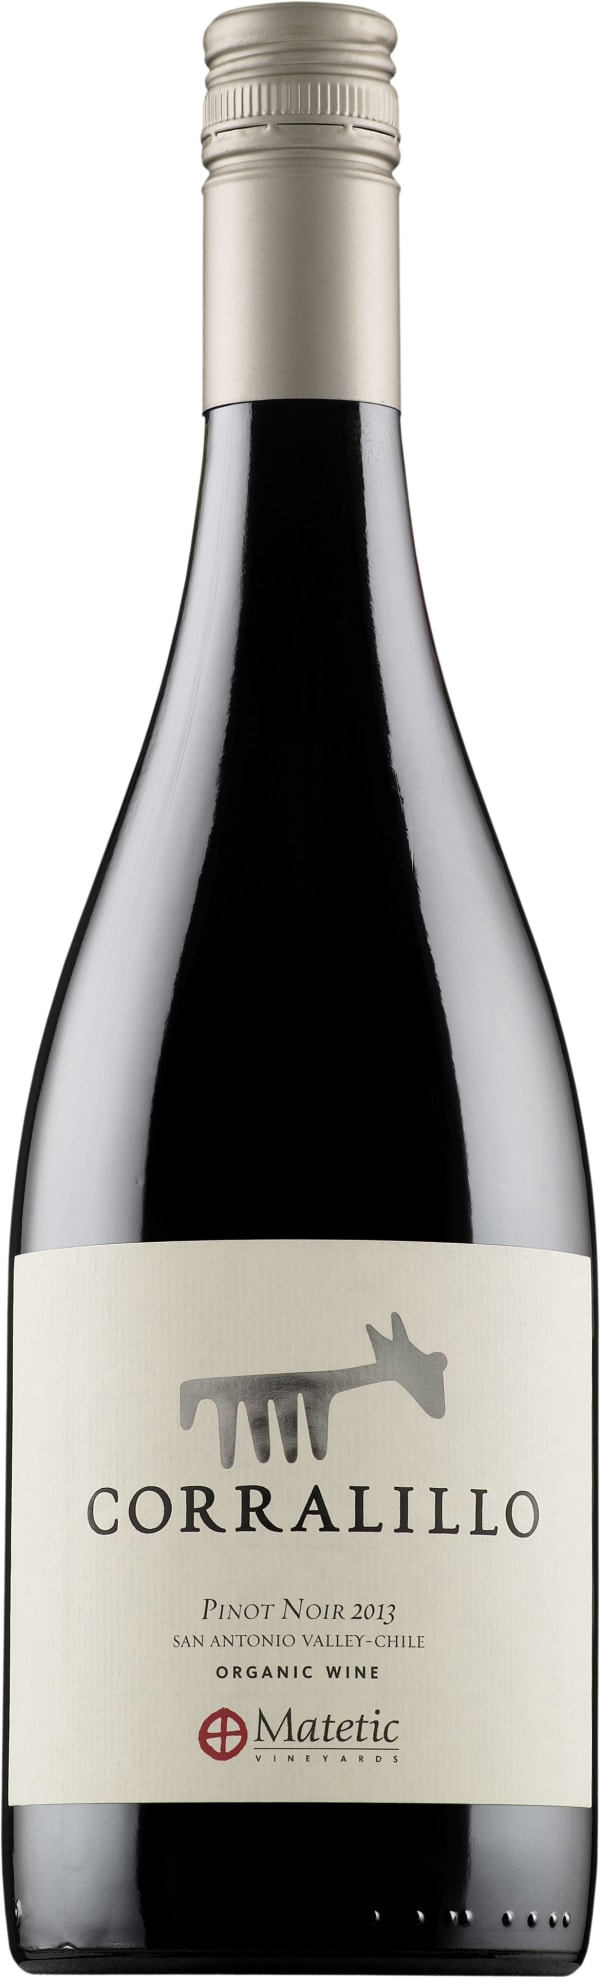 Matetic Corralillo Pinot Noir 2015